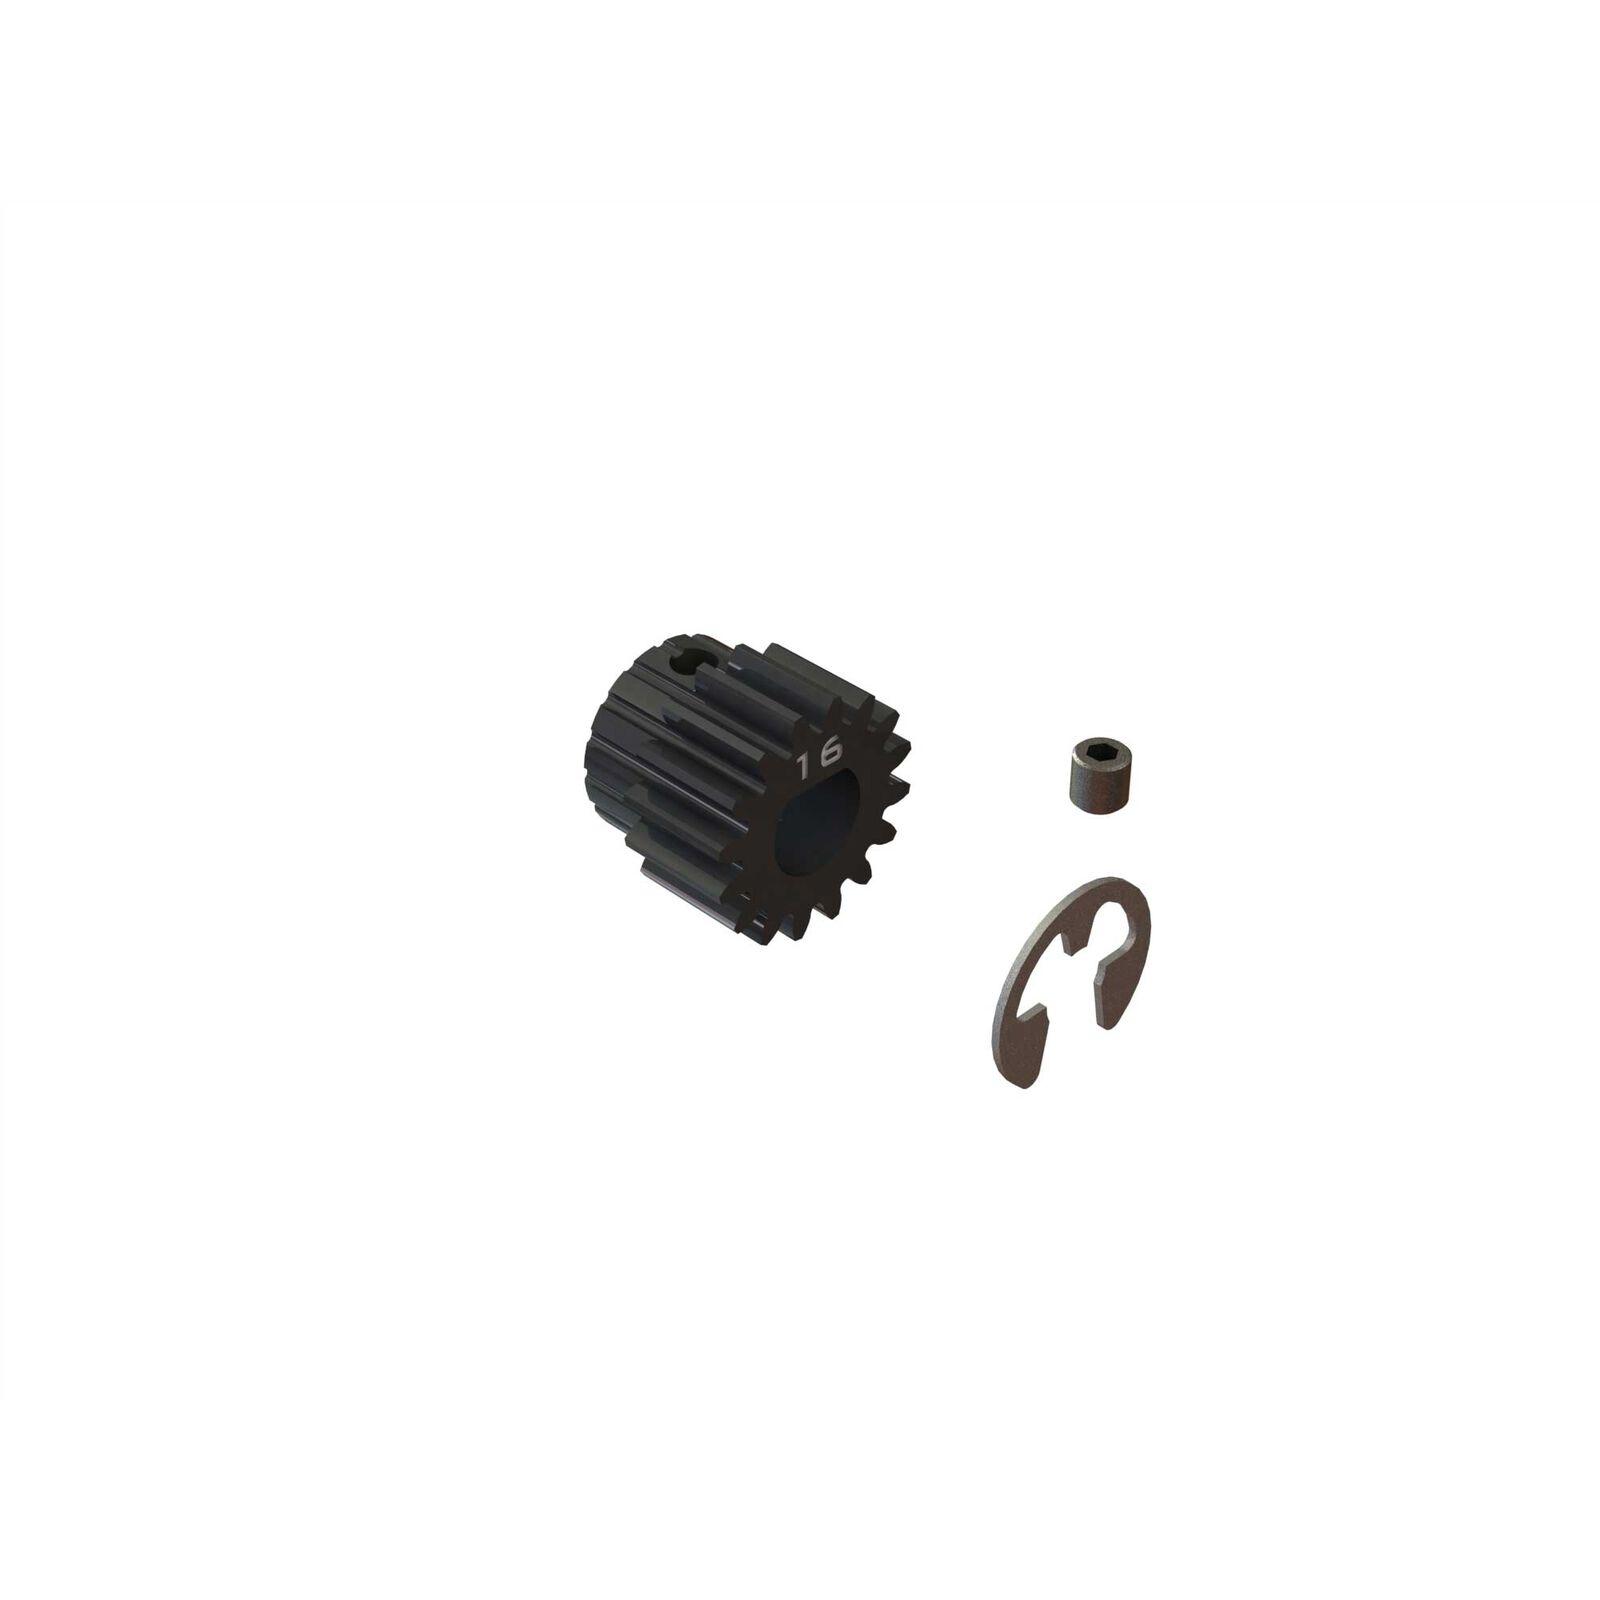 16T Mod1 Safe-D8 Pinion Gear